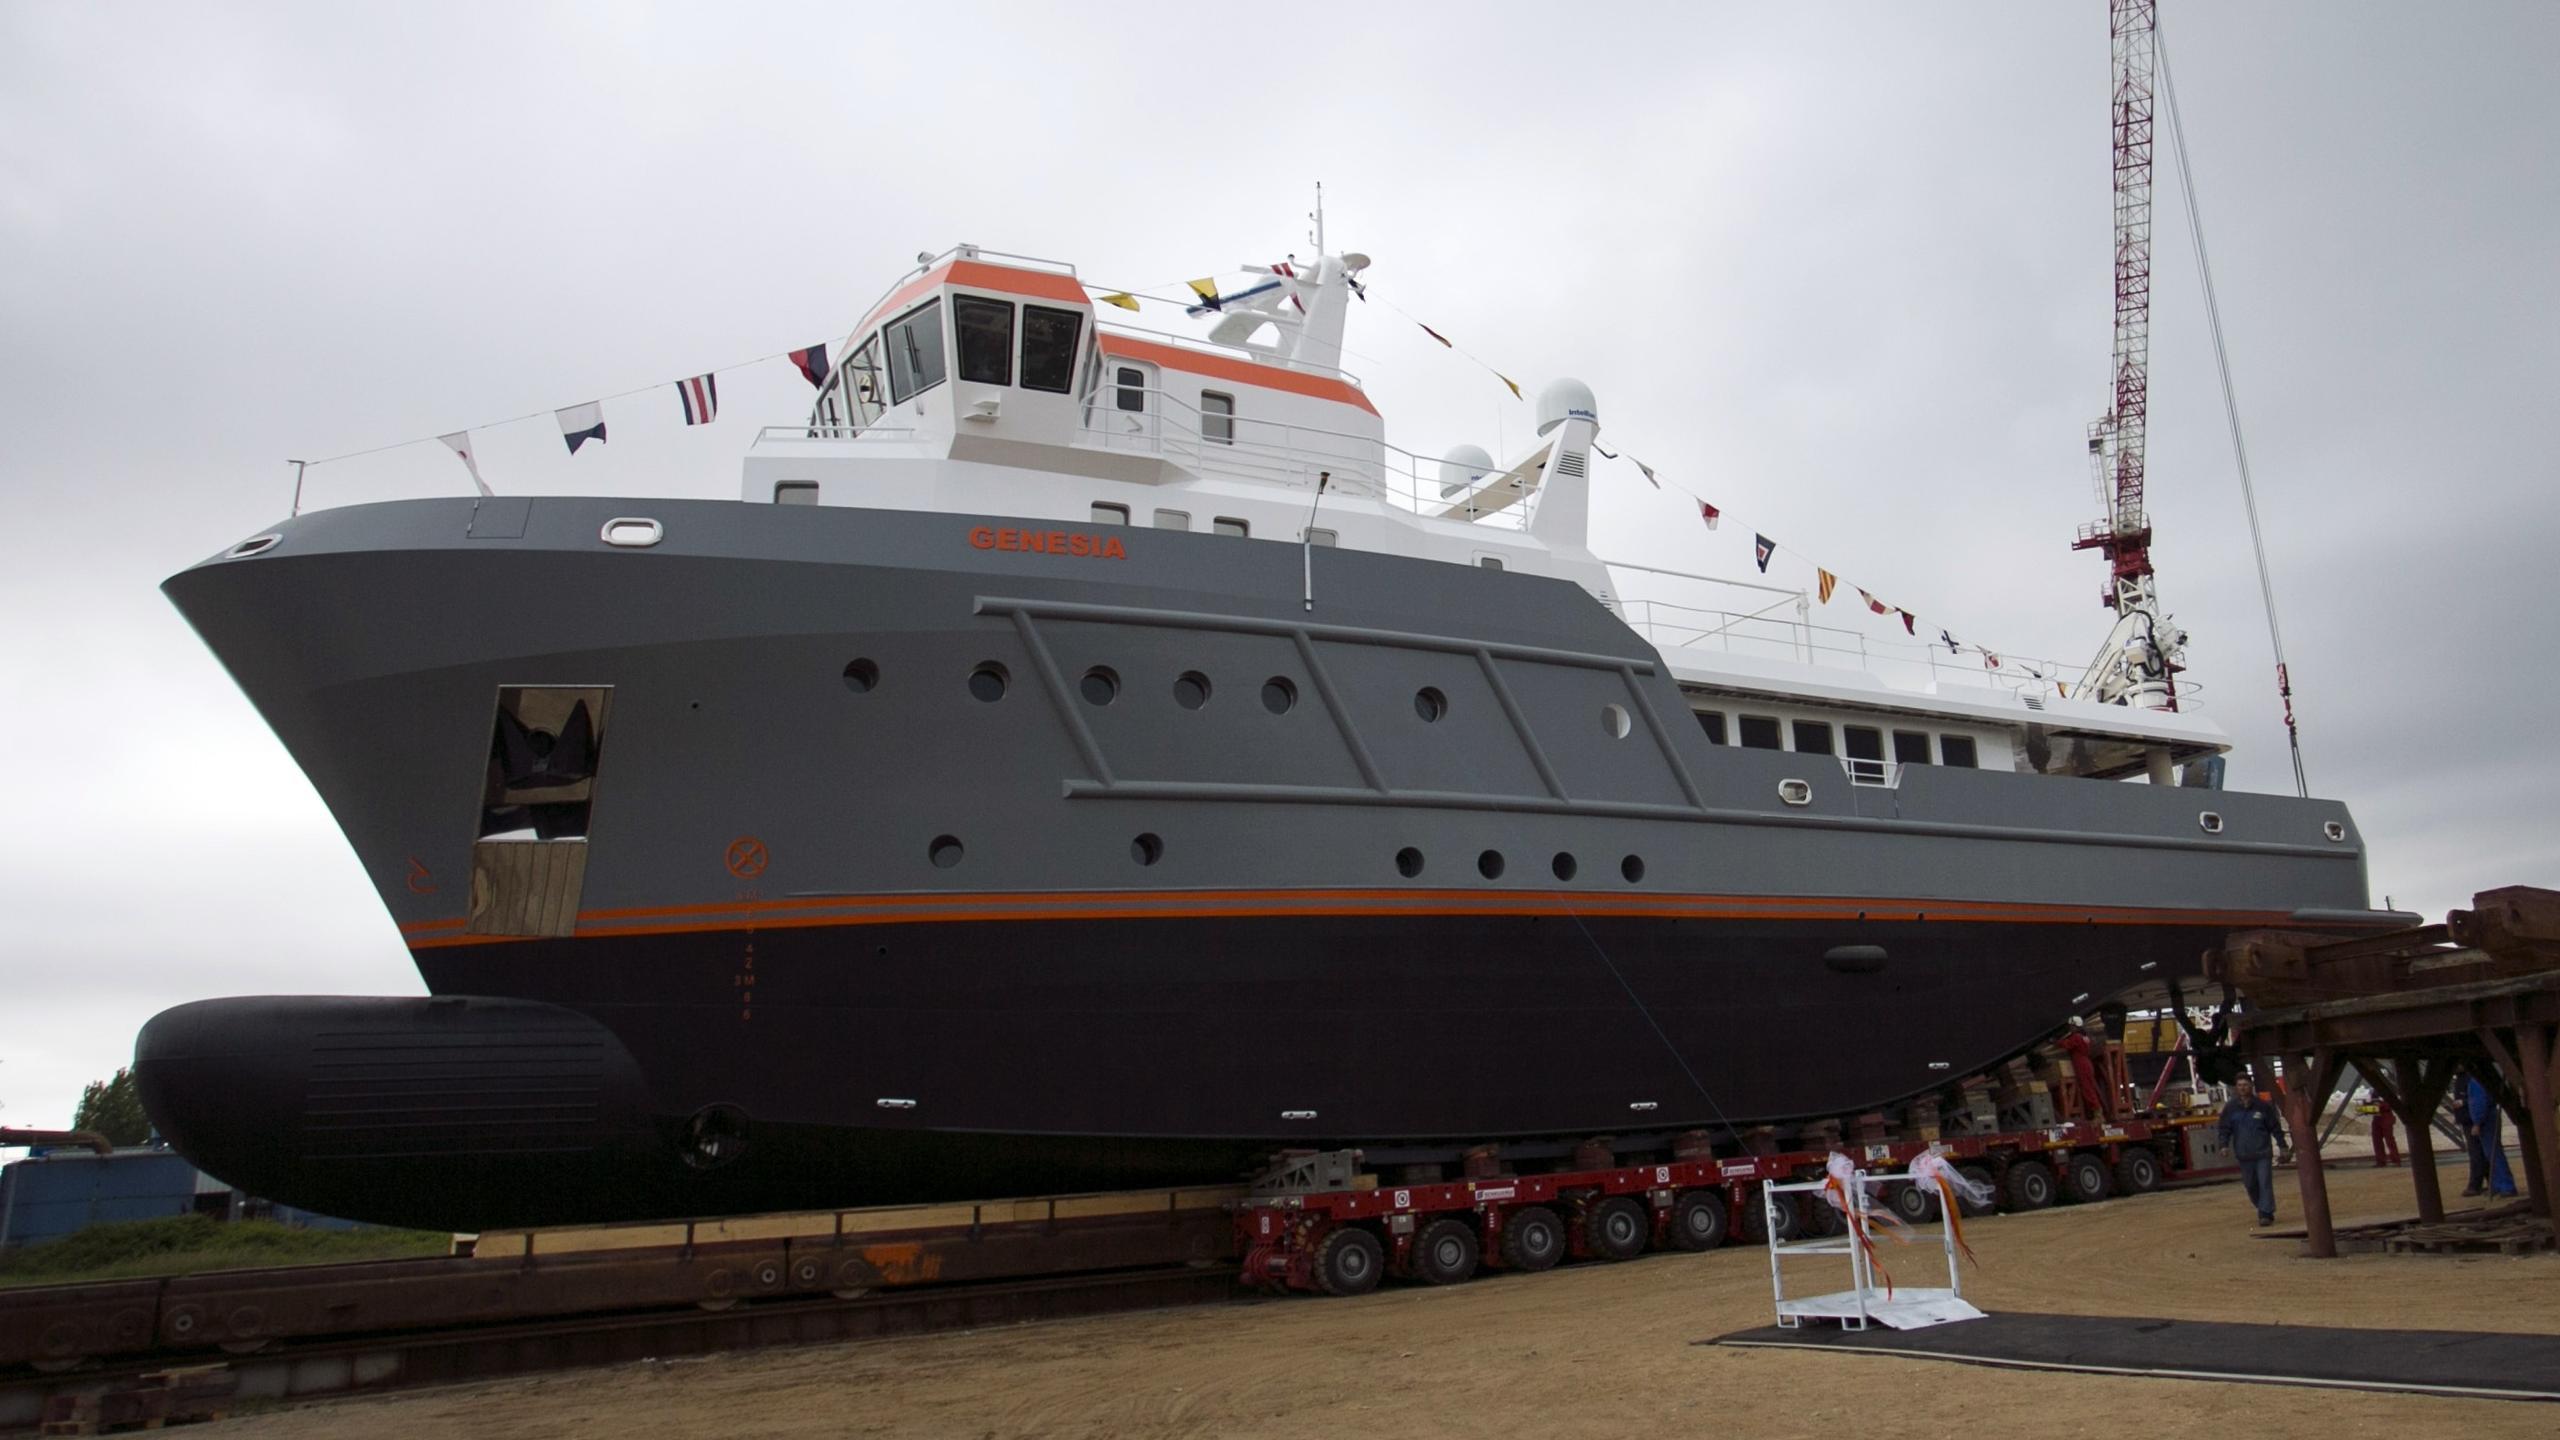 genesia motoryacht chioggia ocean king 130 yacht 40m 2017 launch profile